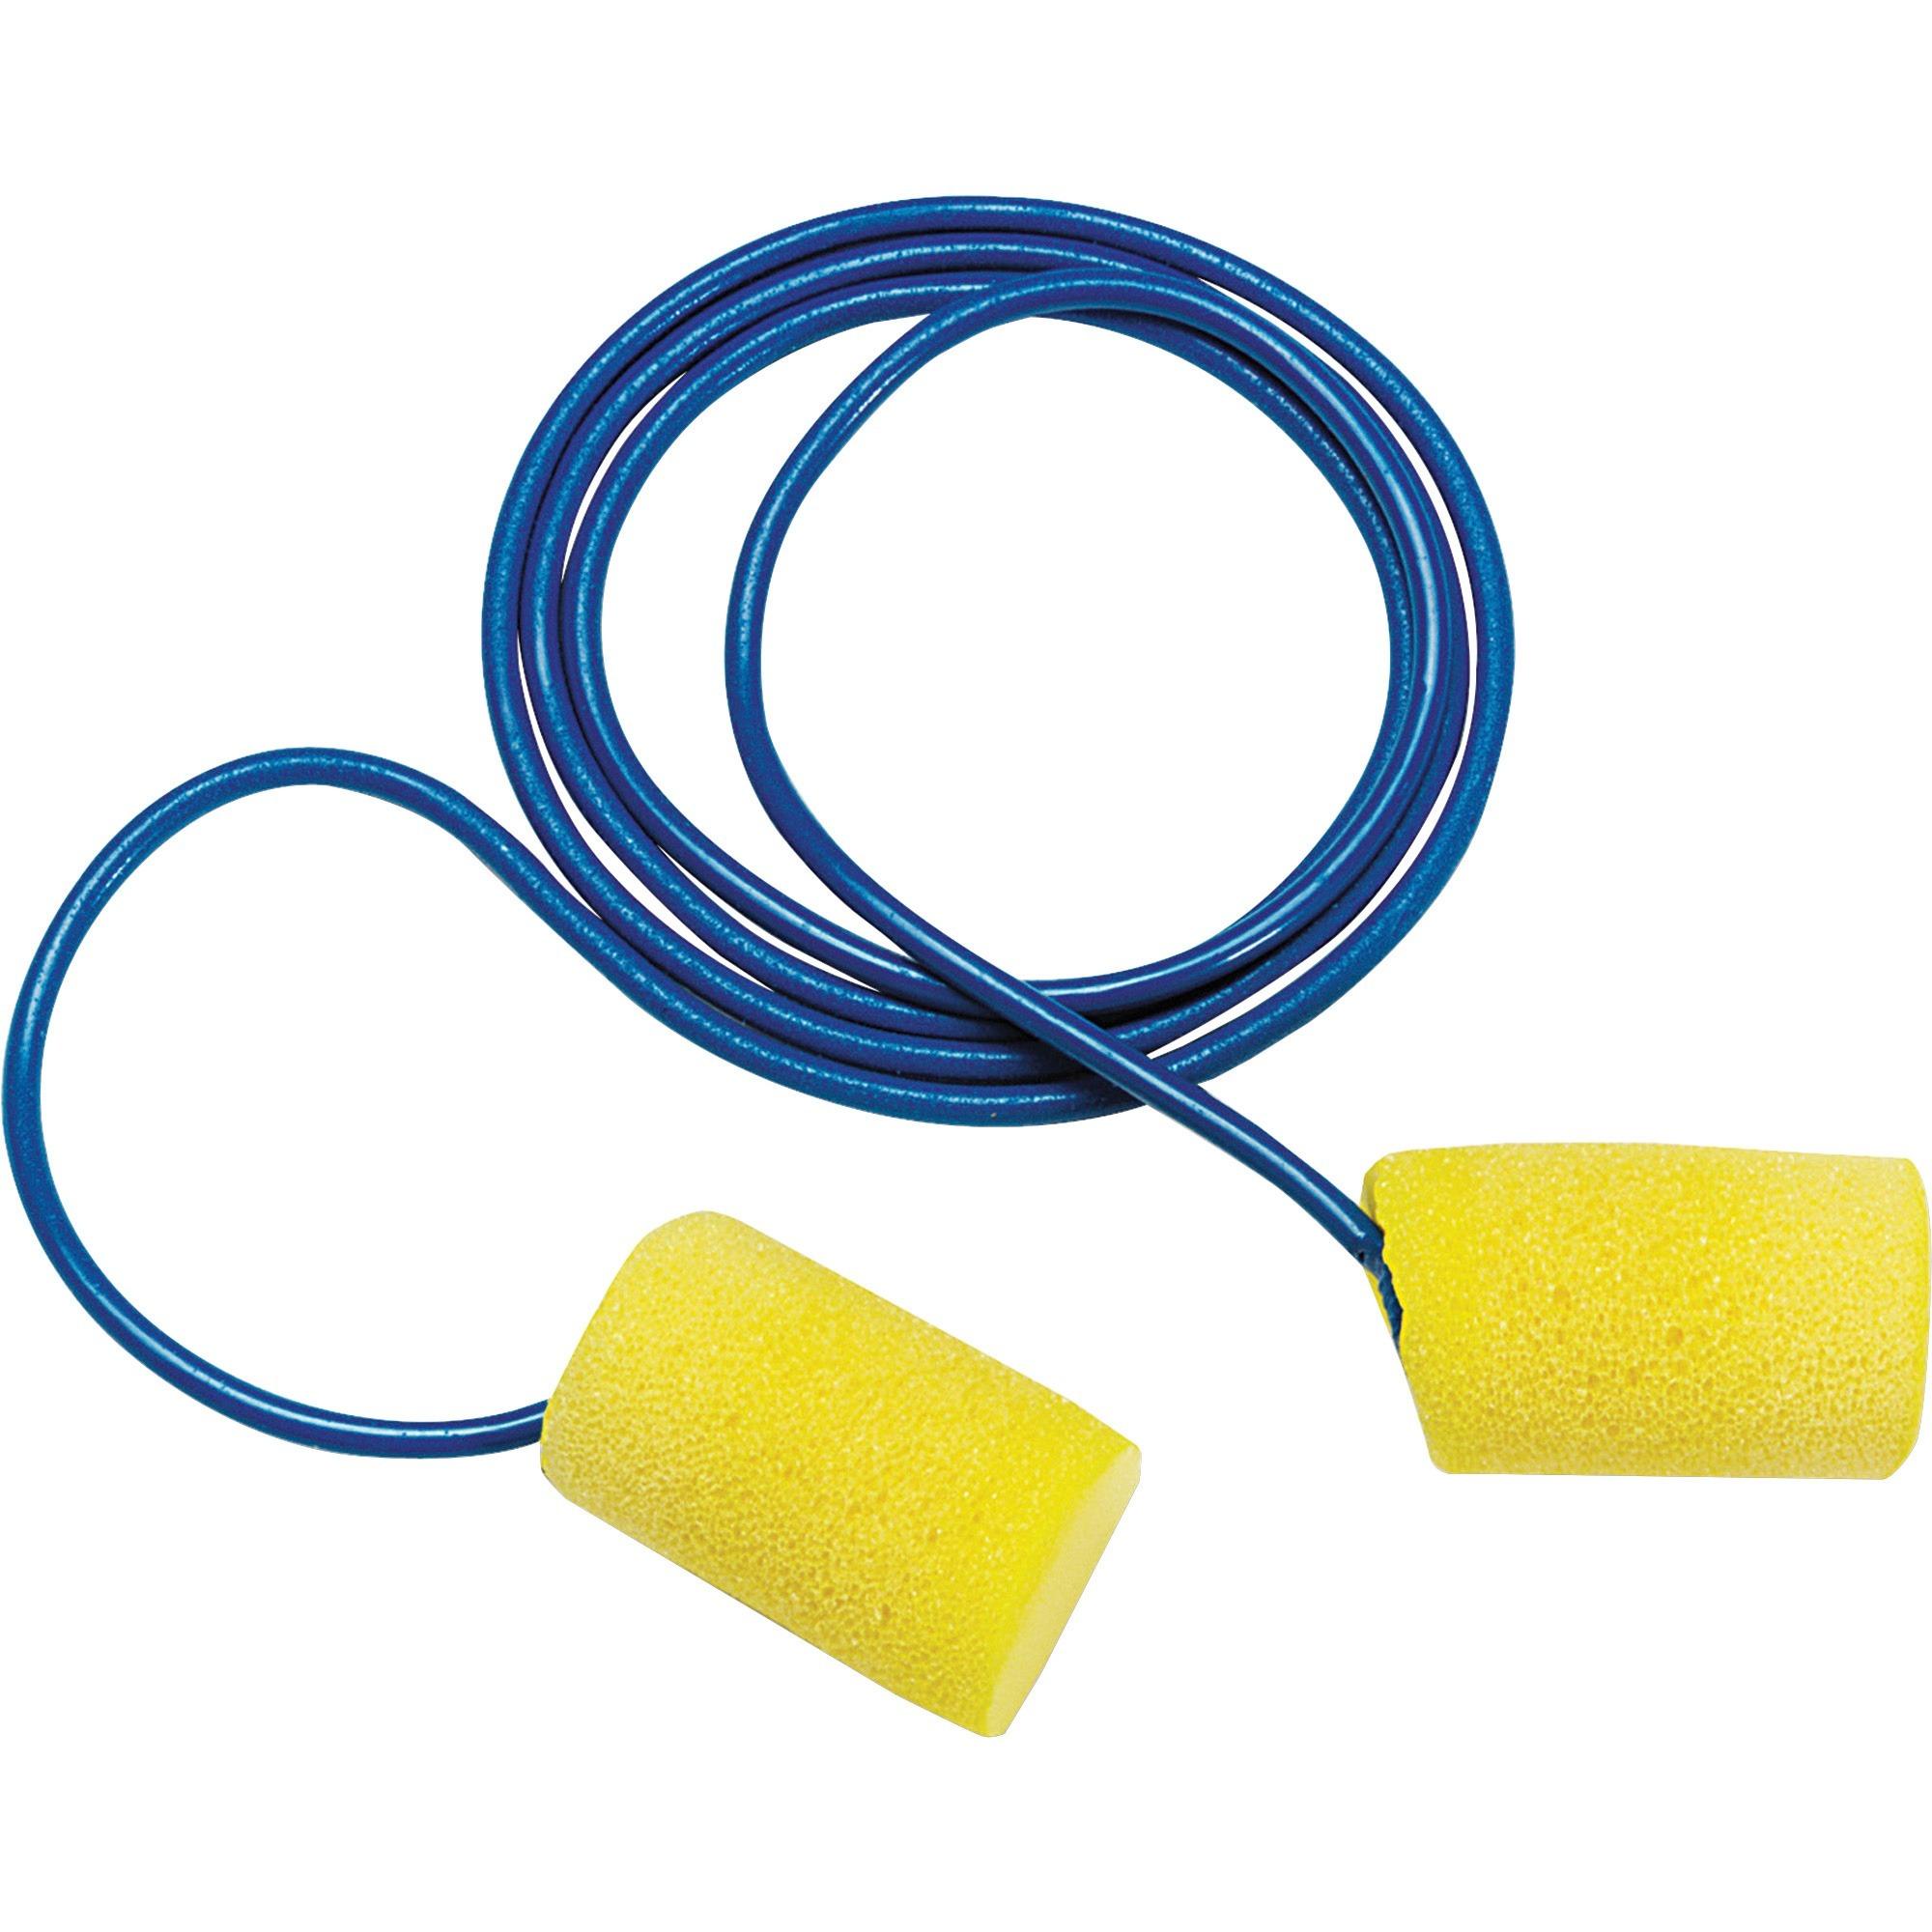 Aearo Corded Foam Earplugs - Moisture Resistant, Corded - Noise Protection - Foam - Yellow - 200 / Box